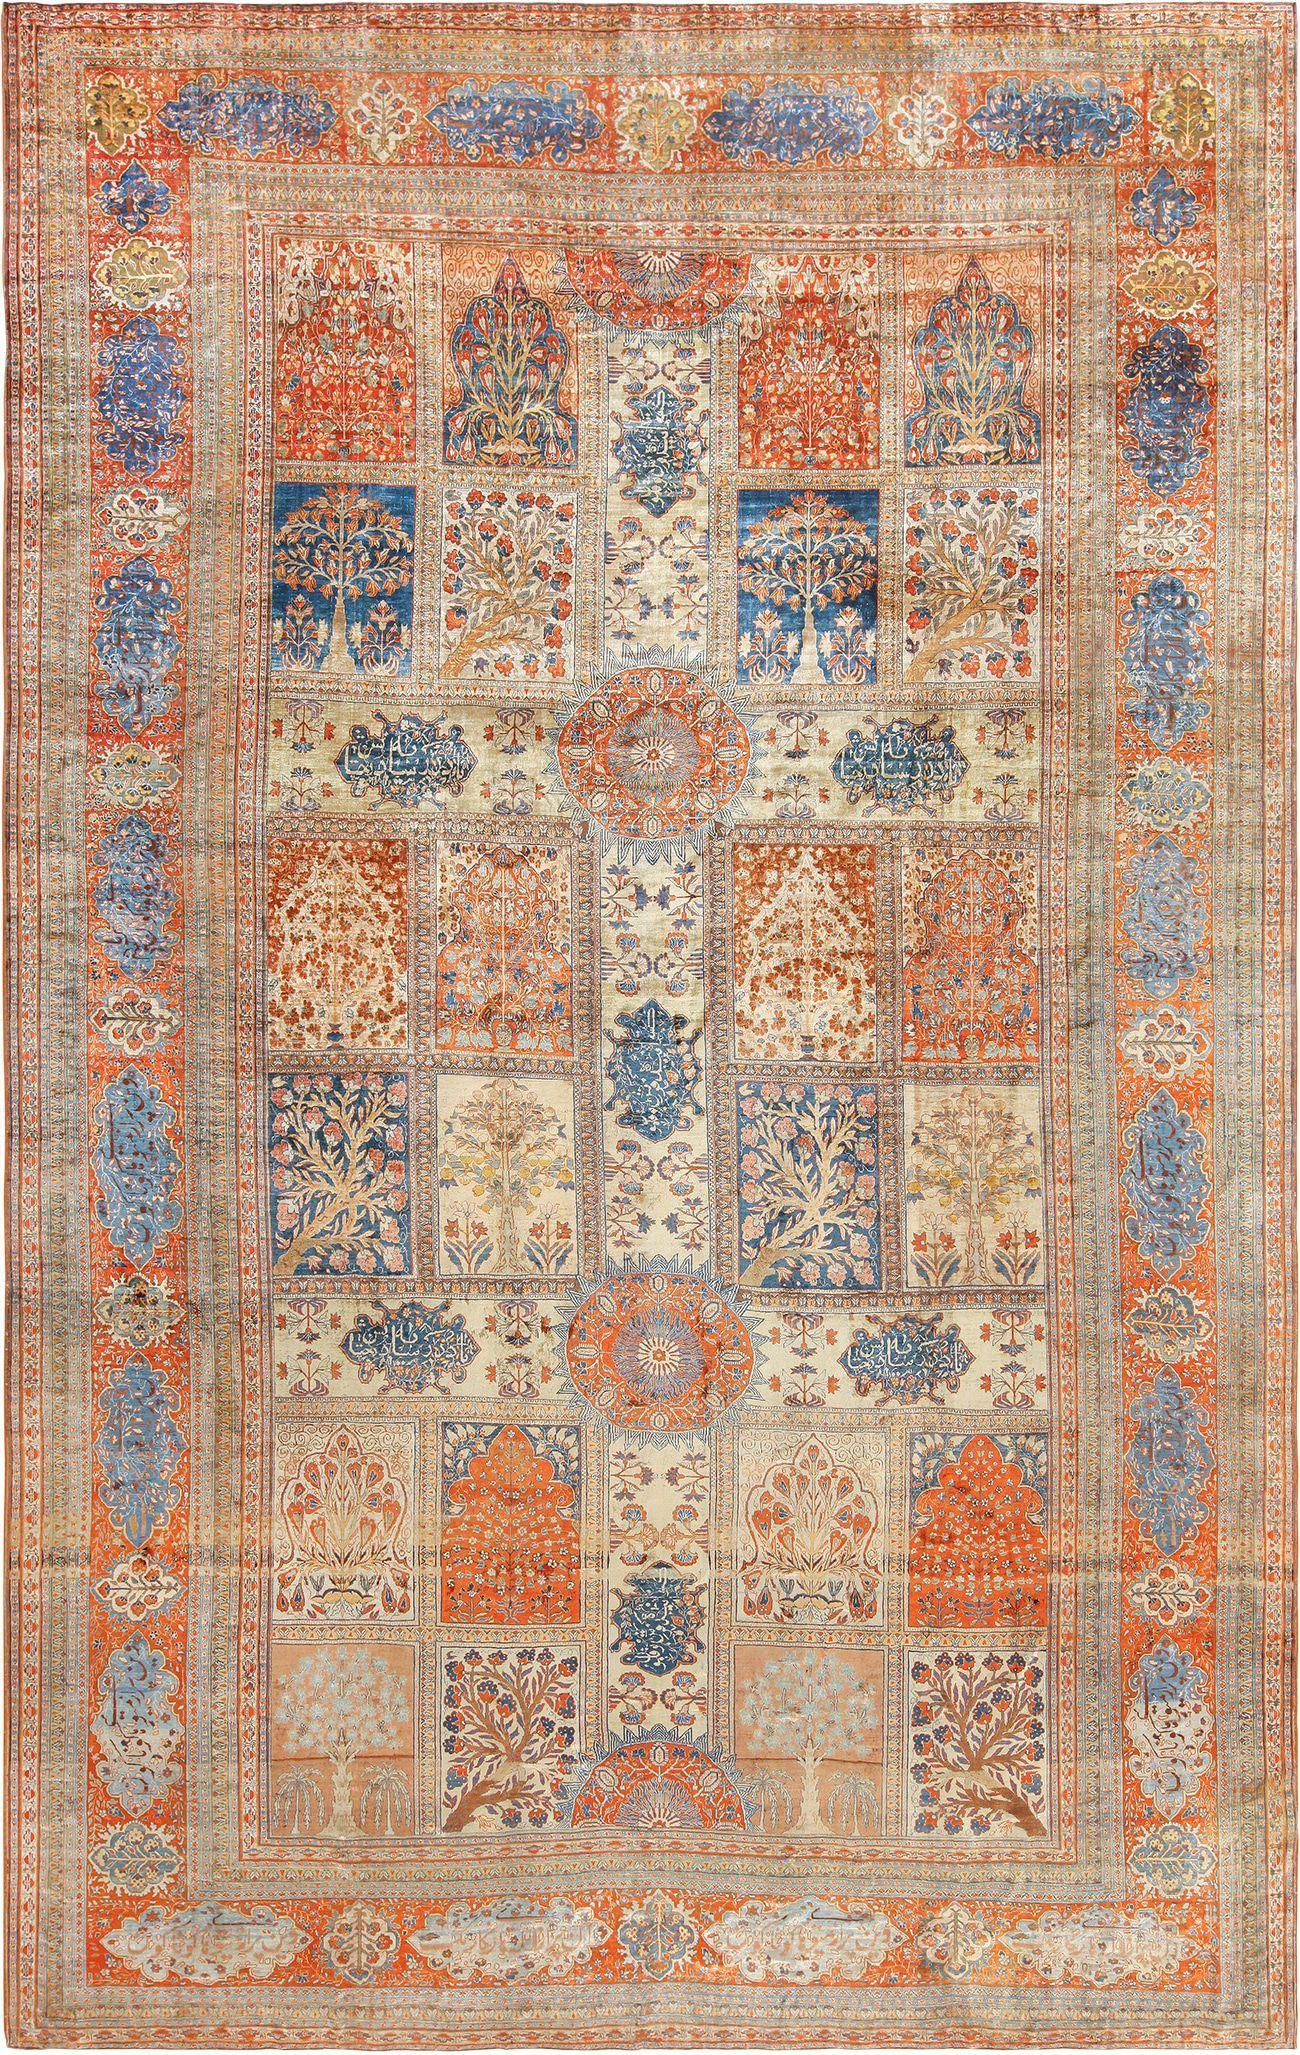 Antique Persian Garden Design Silk Heriz Rug 49140 Nazmiyal Rugs Persian Heriz Rug Rugs Silk Persian Rugs